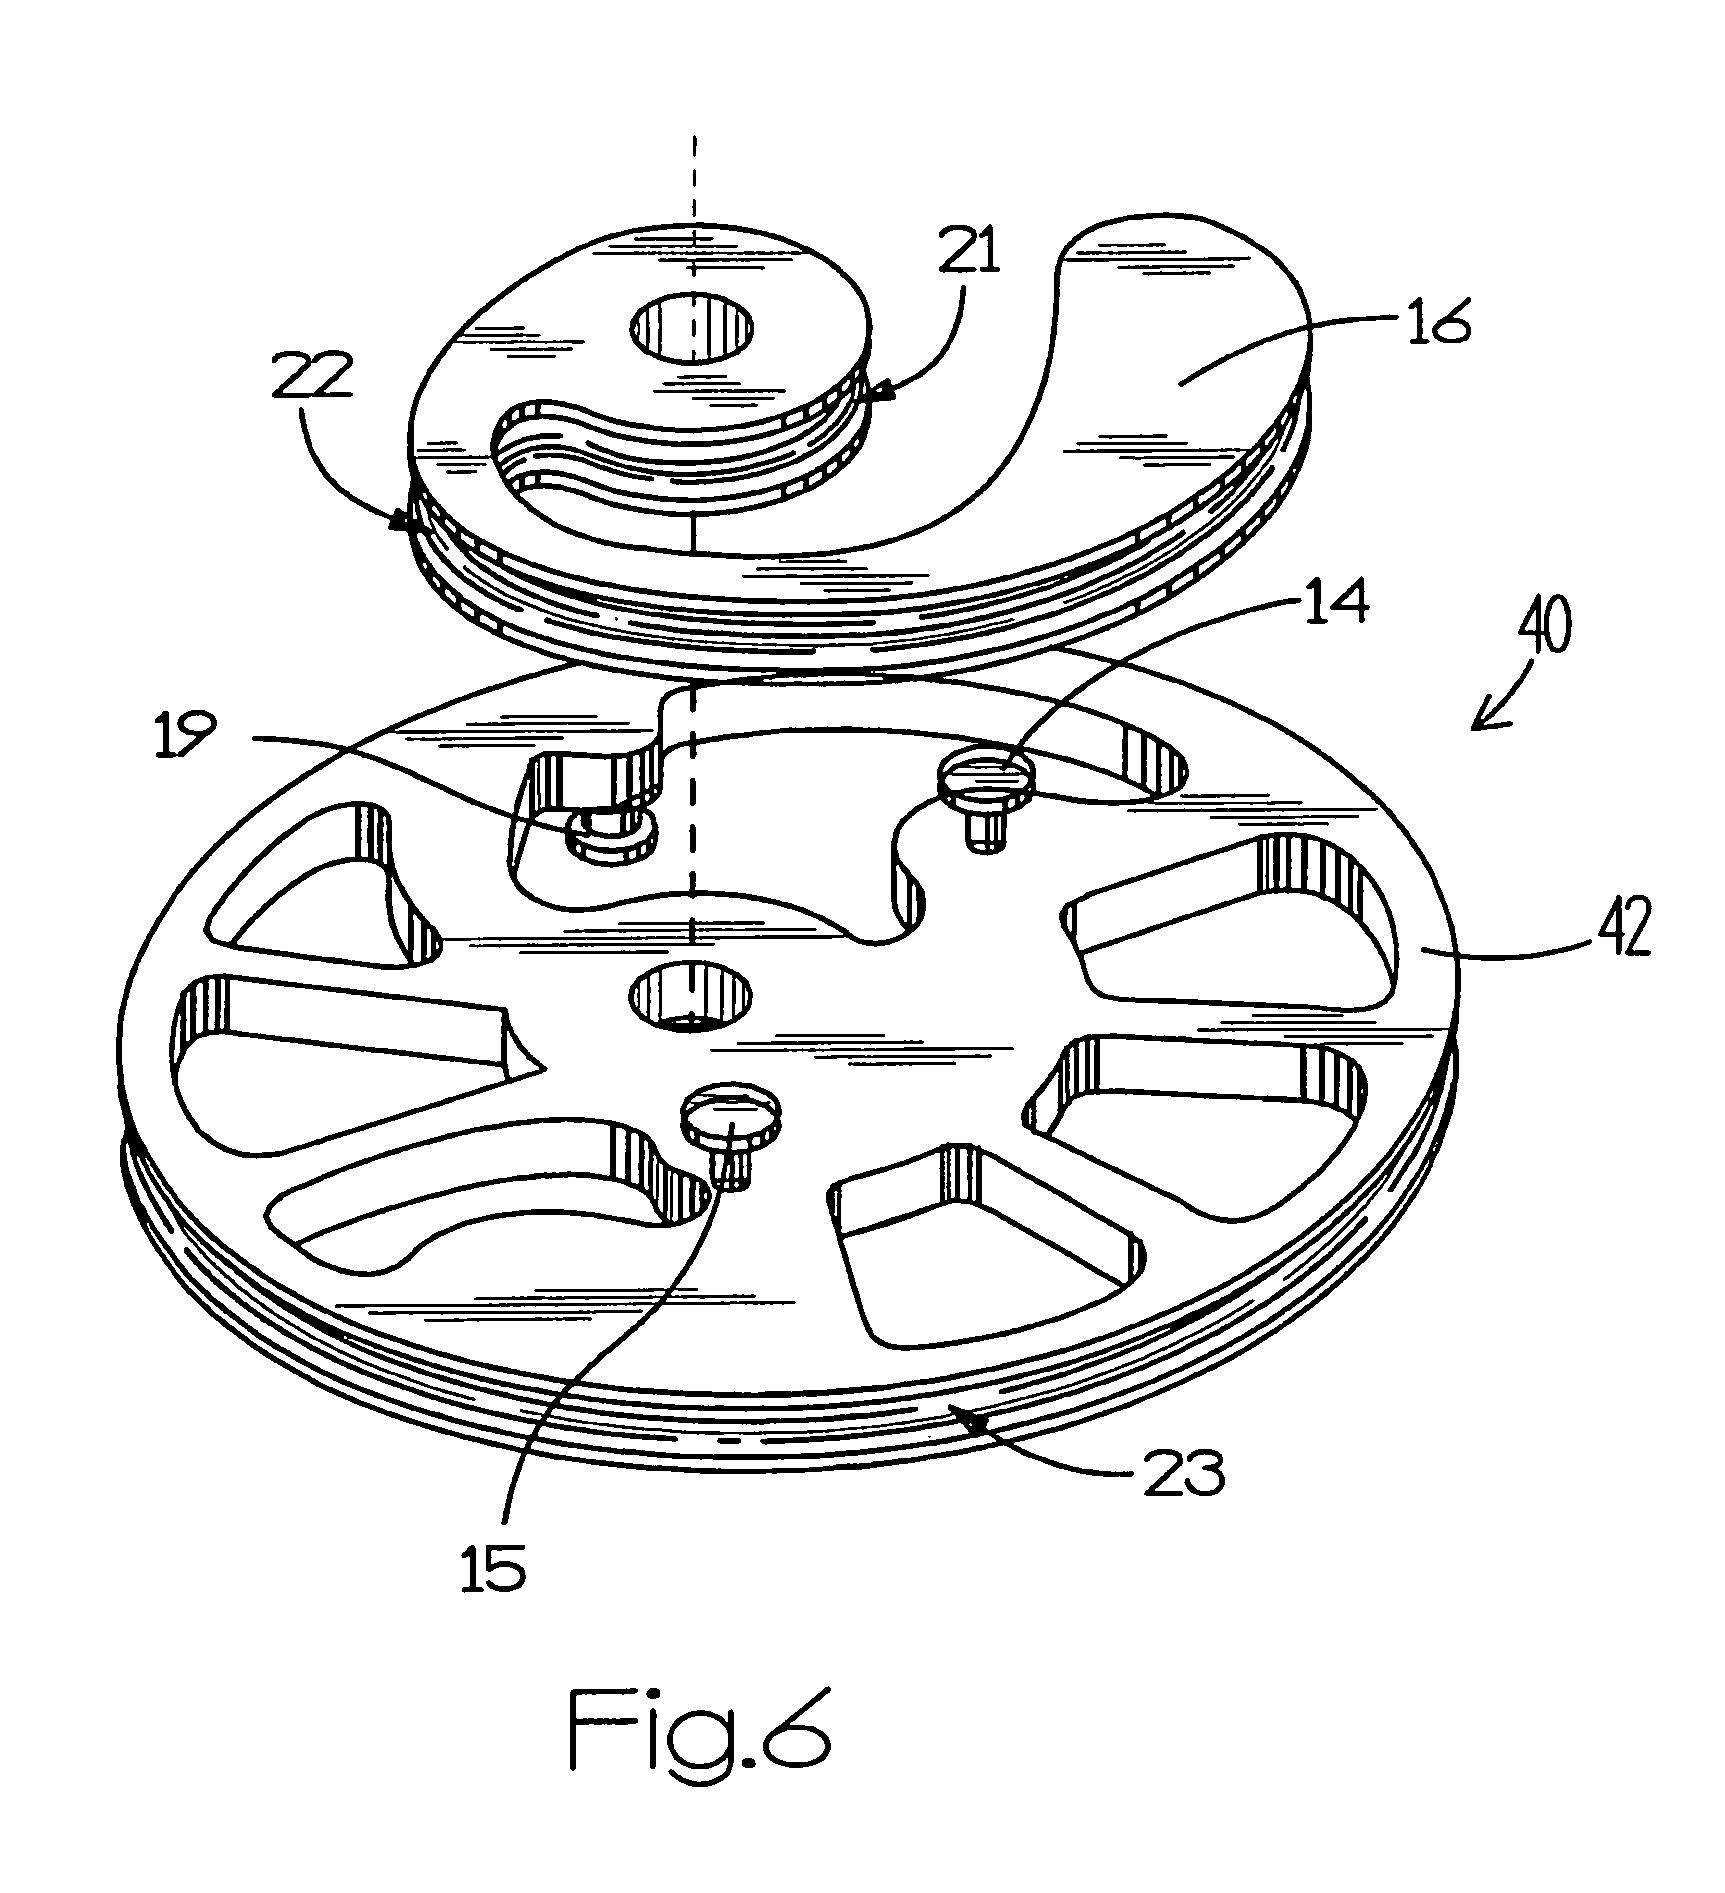 patent us7997259 - compound archery bow